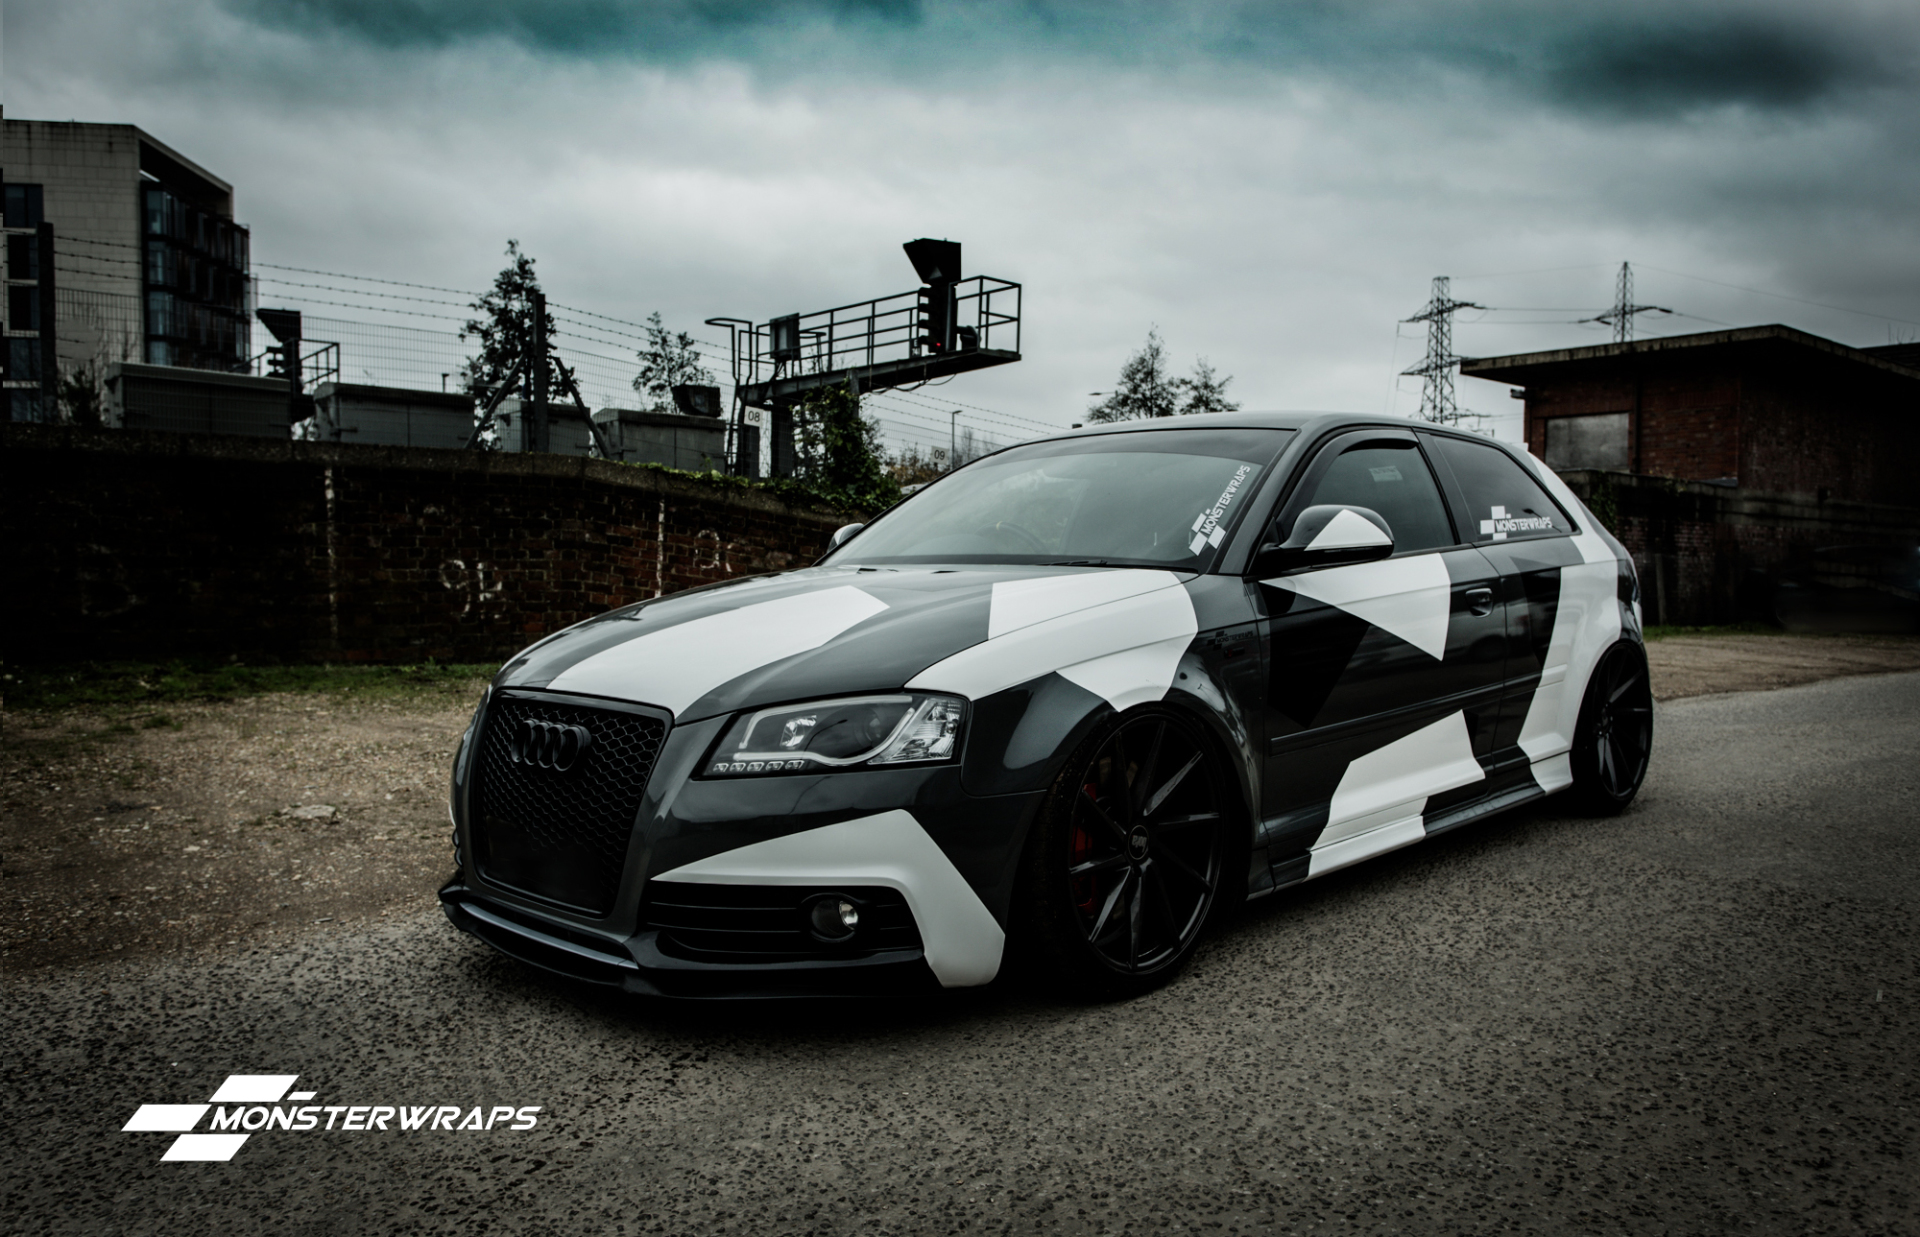 Audi Car Images >> Audi A3 Stealth Grey camo wrap